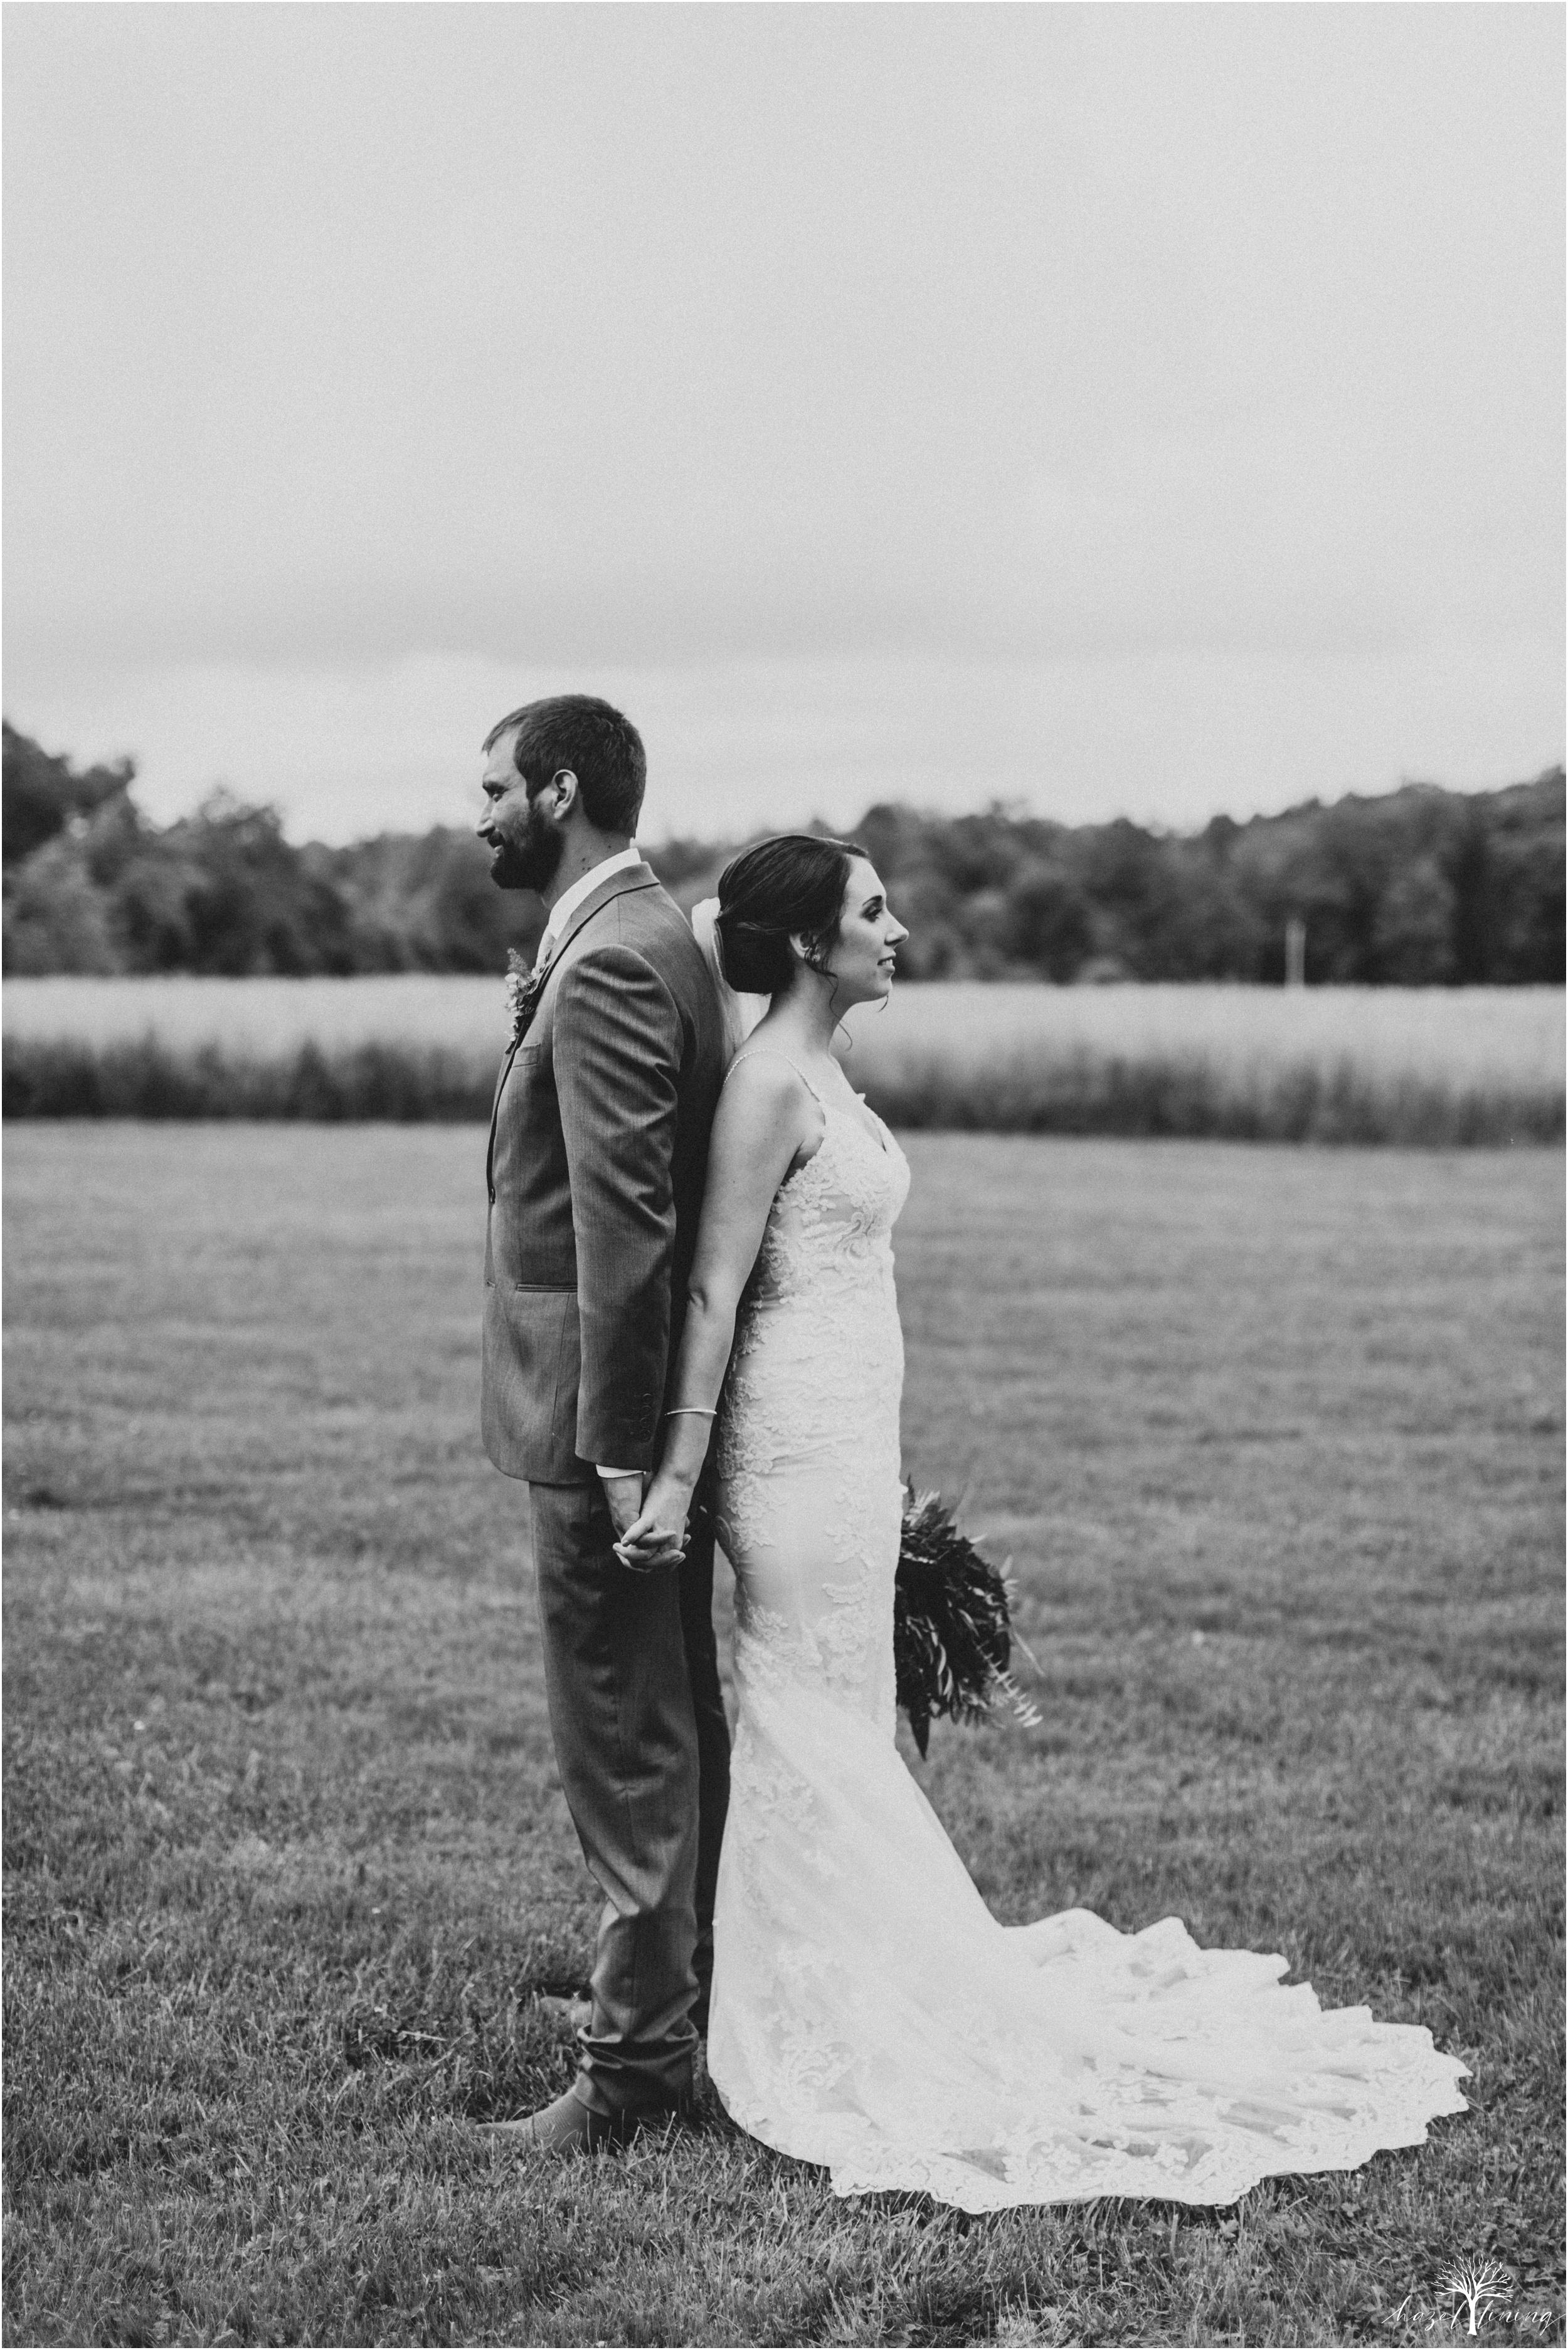 hazel-lining-travel-wedding-elopement-photography-lisa-landon-shoemaker-the-farm-bakery-and-events-bucks-county-quakertown-pennsylvania-summer-country-outdoor-farm-wedding_0092.jpg